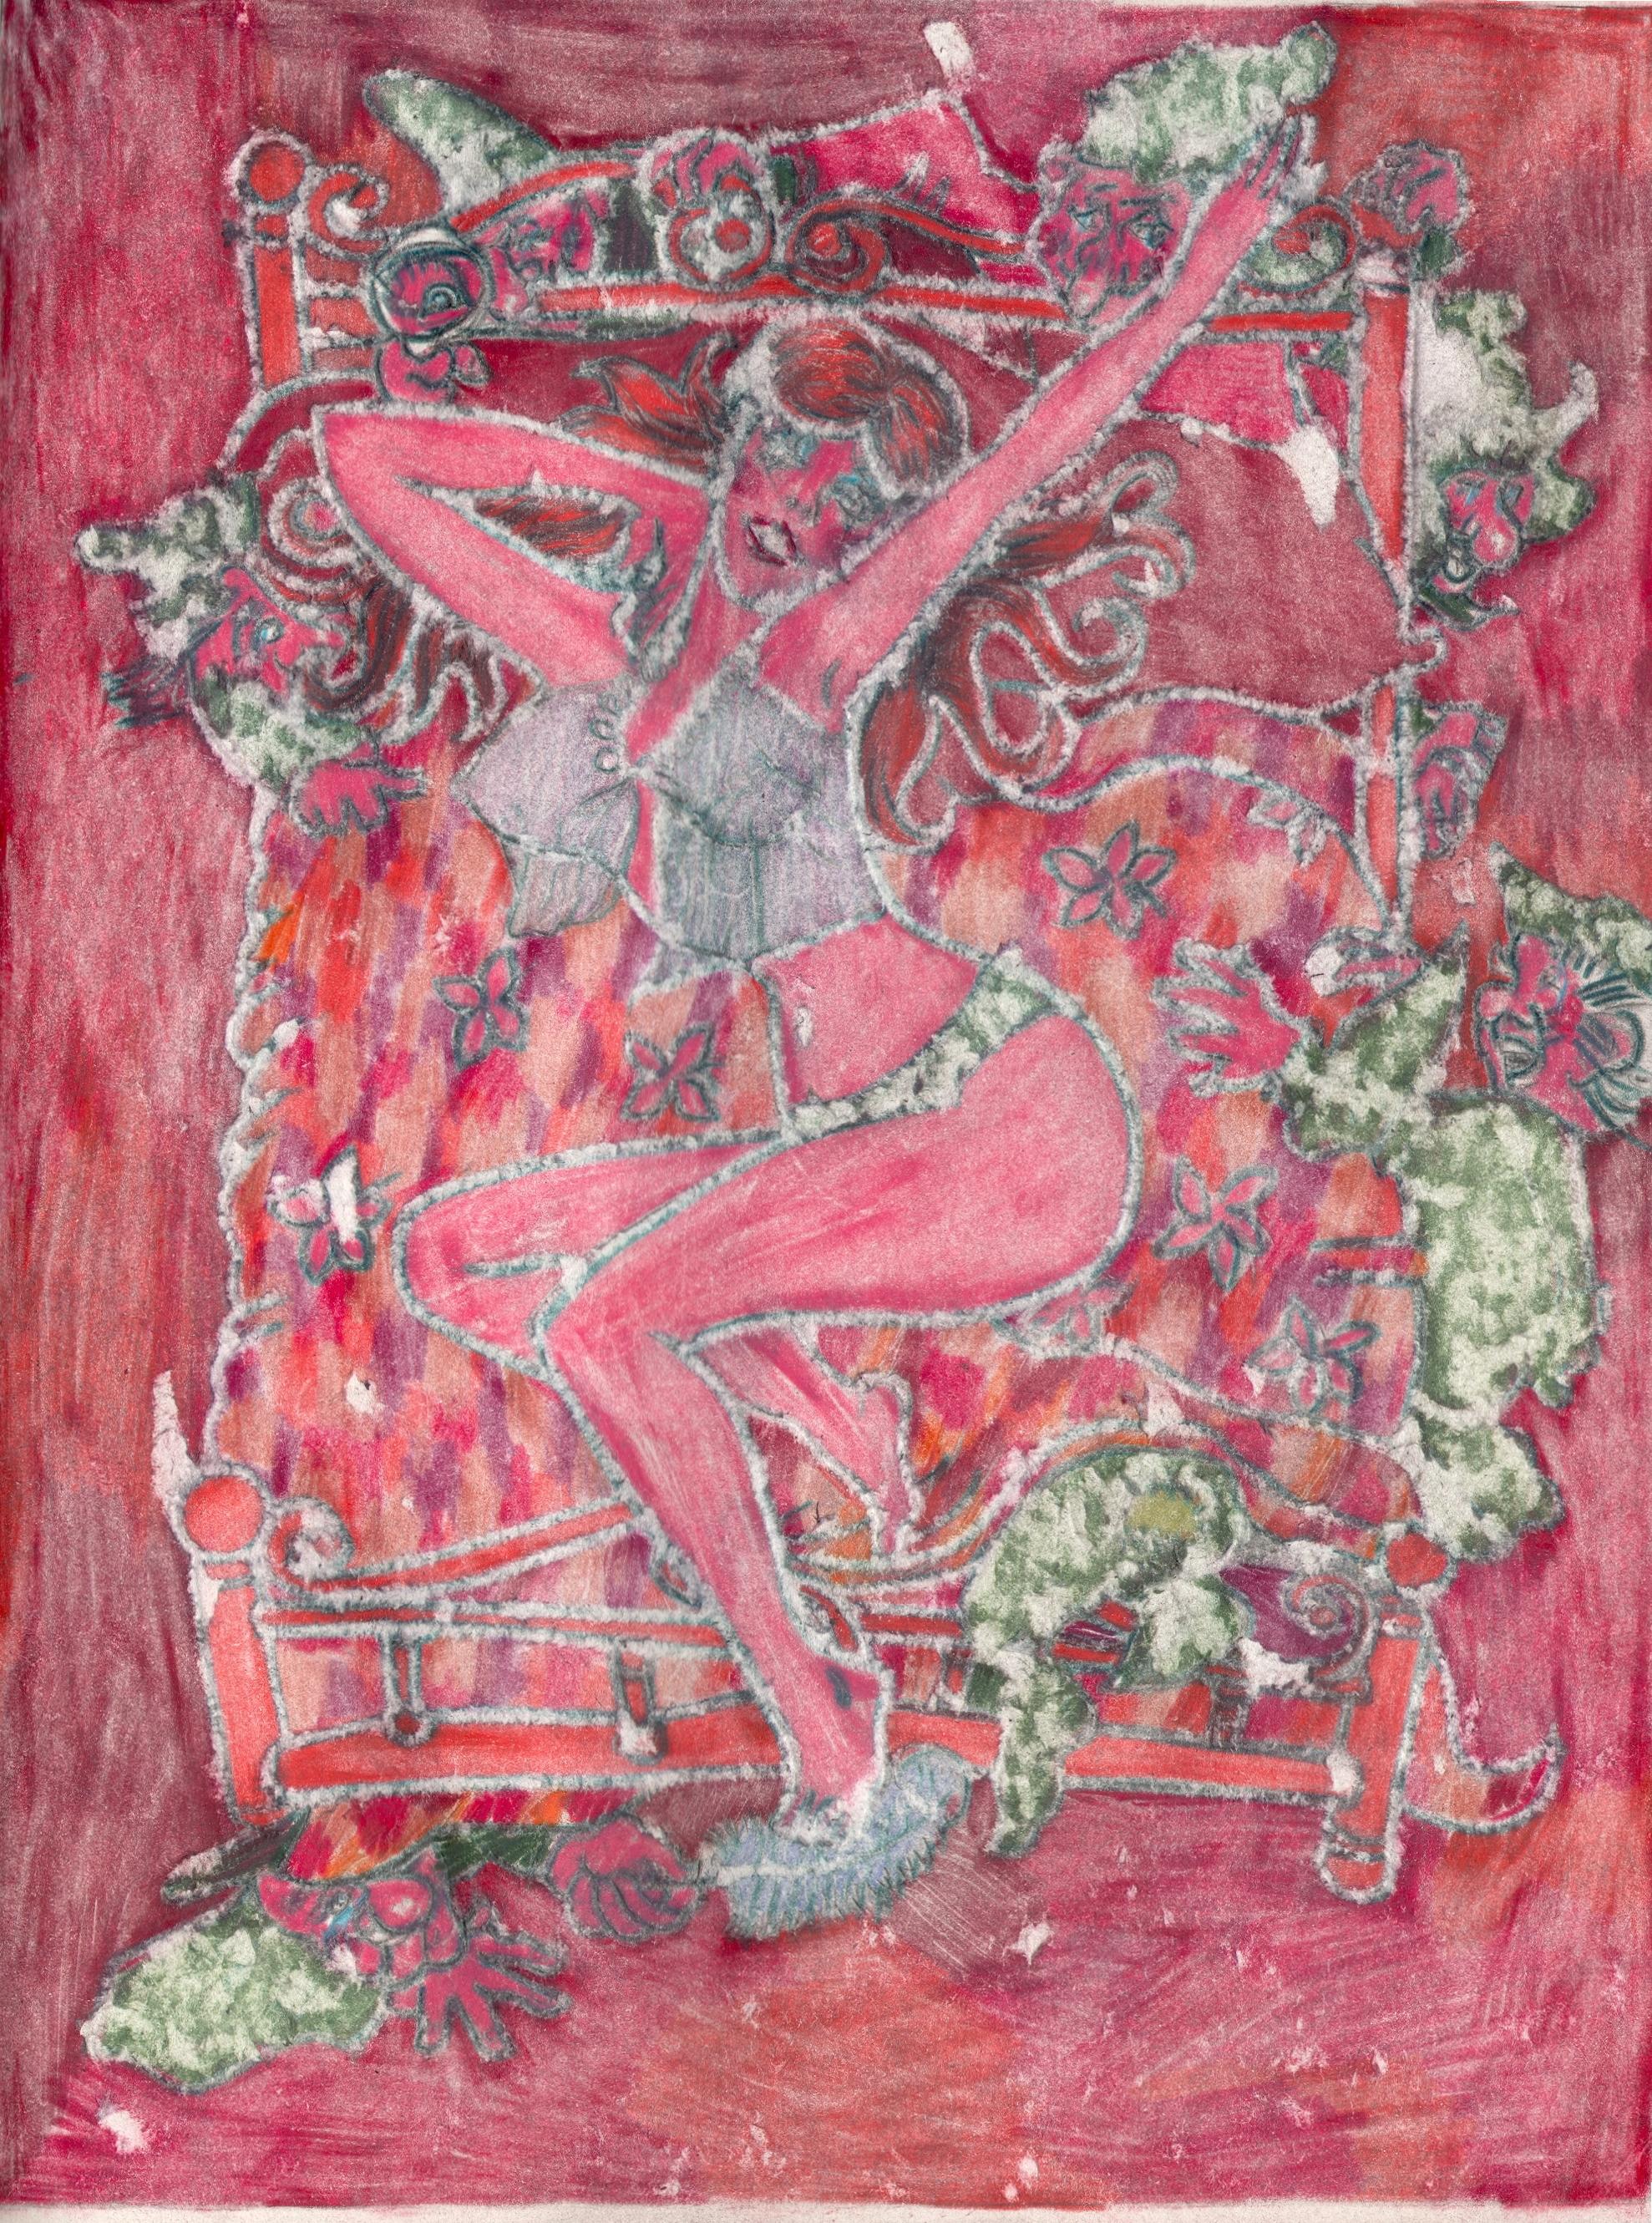 O.T. ( Pinup Fairy Tale II ), 2019  Buntstift auf Papier, 26x35.5cm